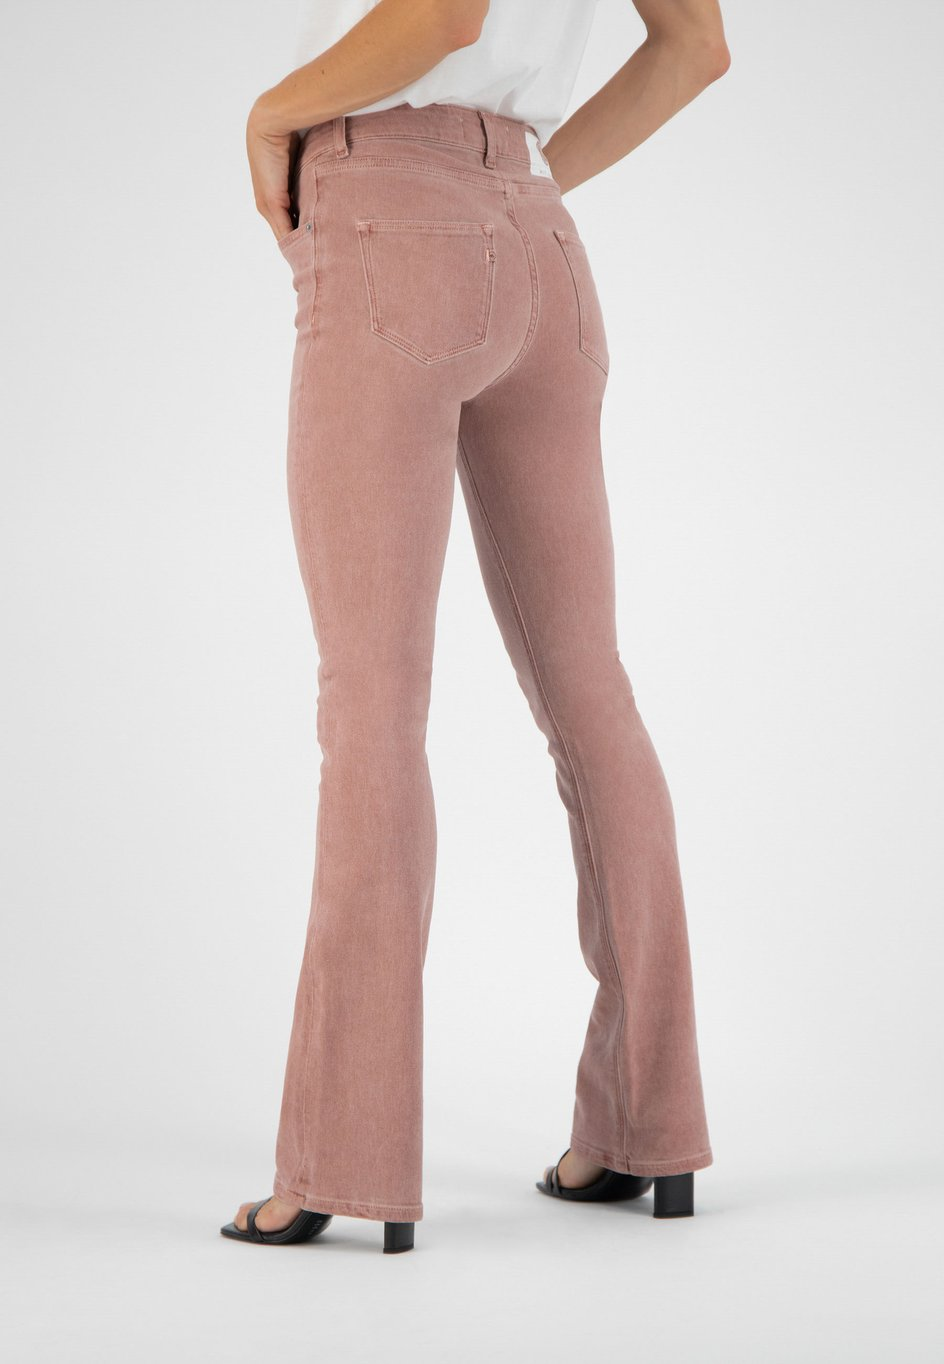 Woman-Eco-Jeans-Flared-Hazen-Terra-Halfback_473x682@2x